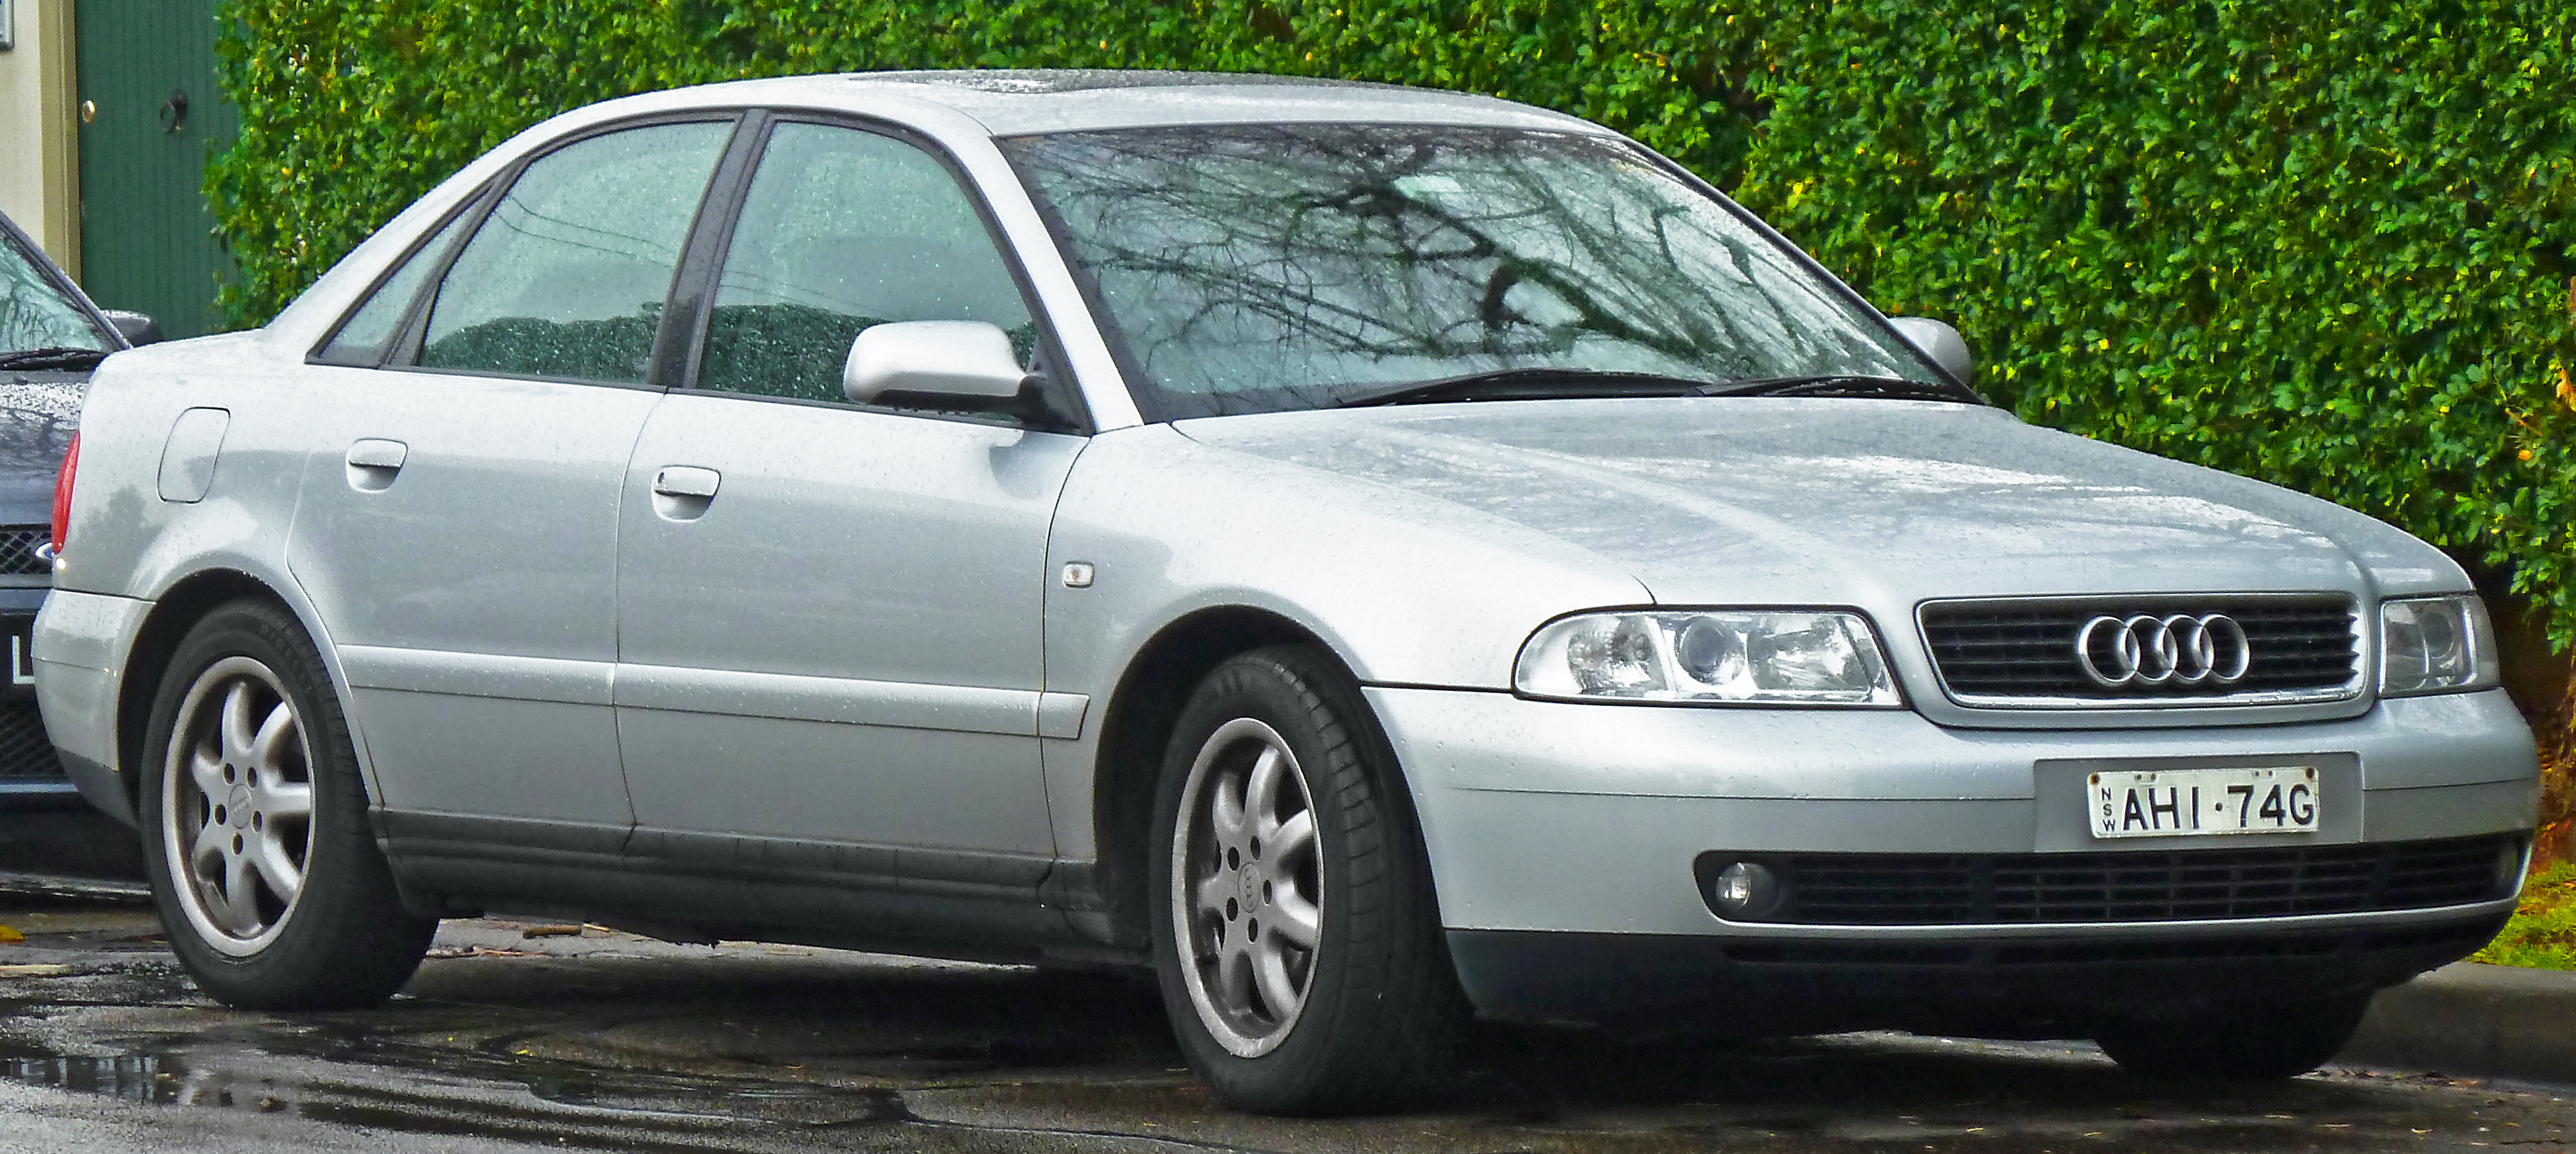 Description 1999 2001 Audi A4 8D 18 T Quattro Sedan 2011